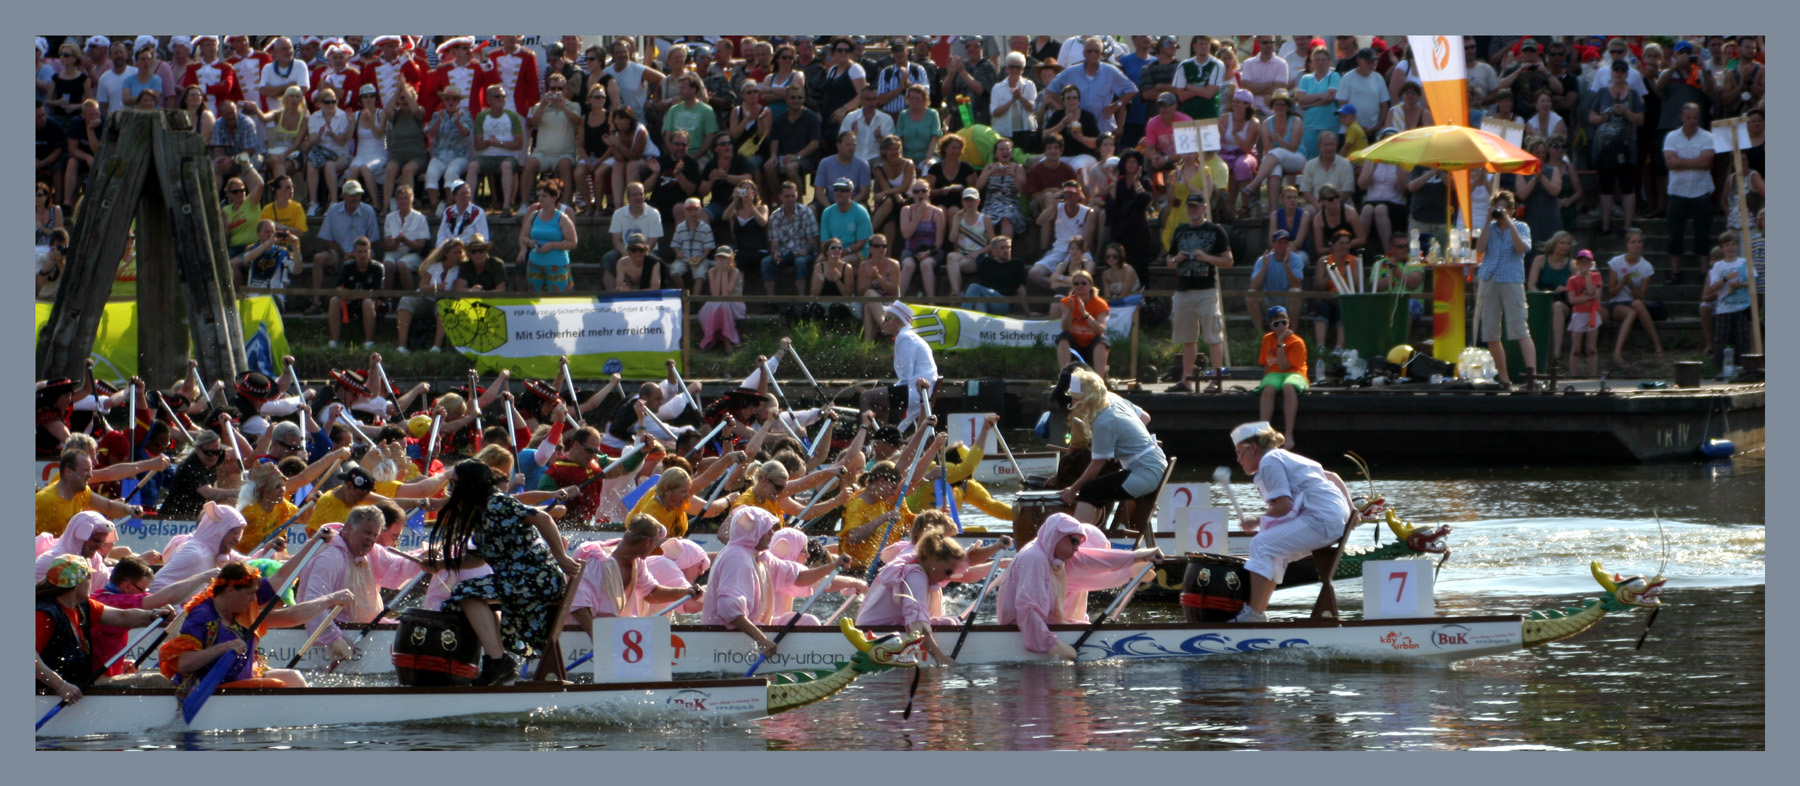 Drachenbootfestival in Lübeck